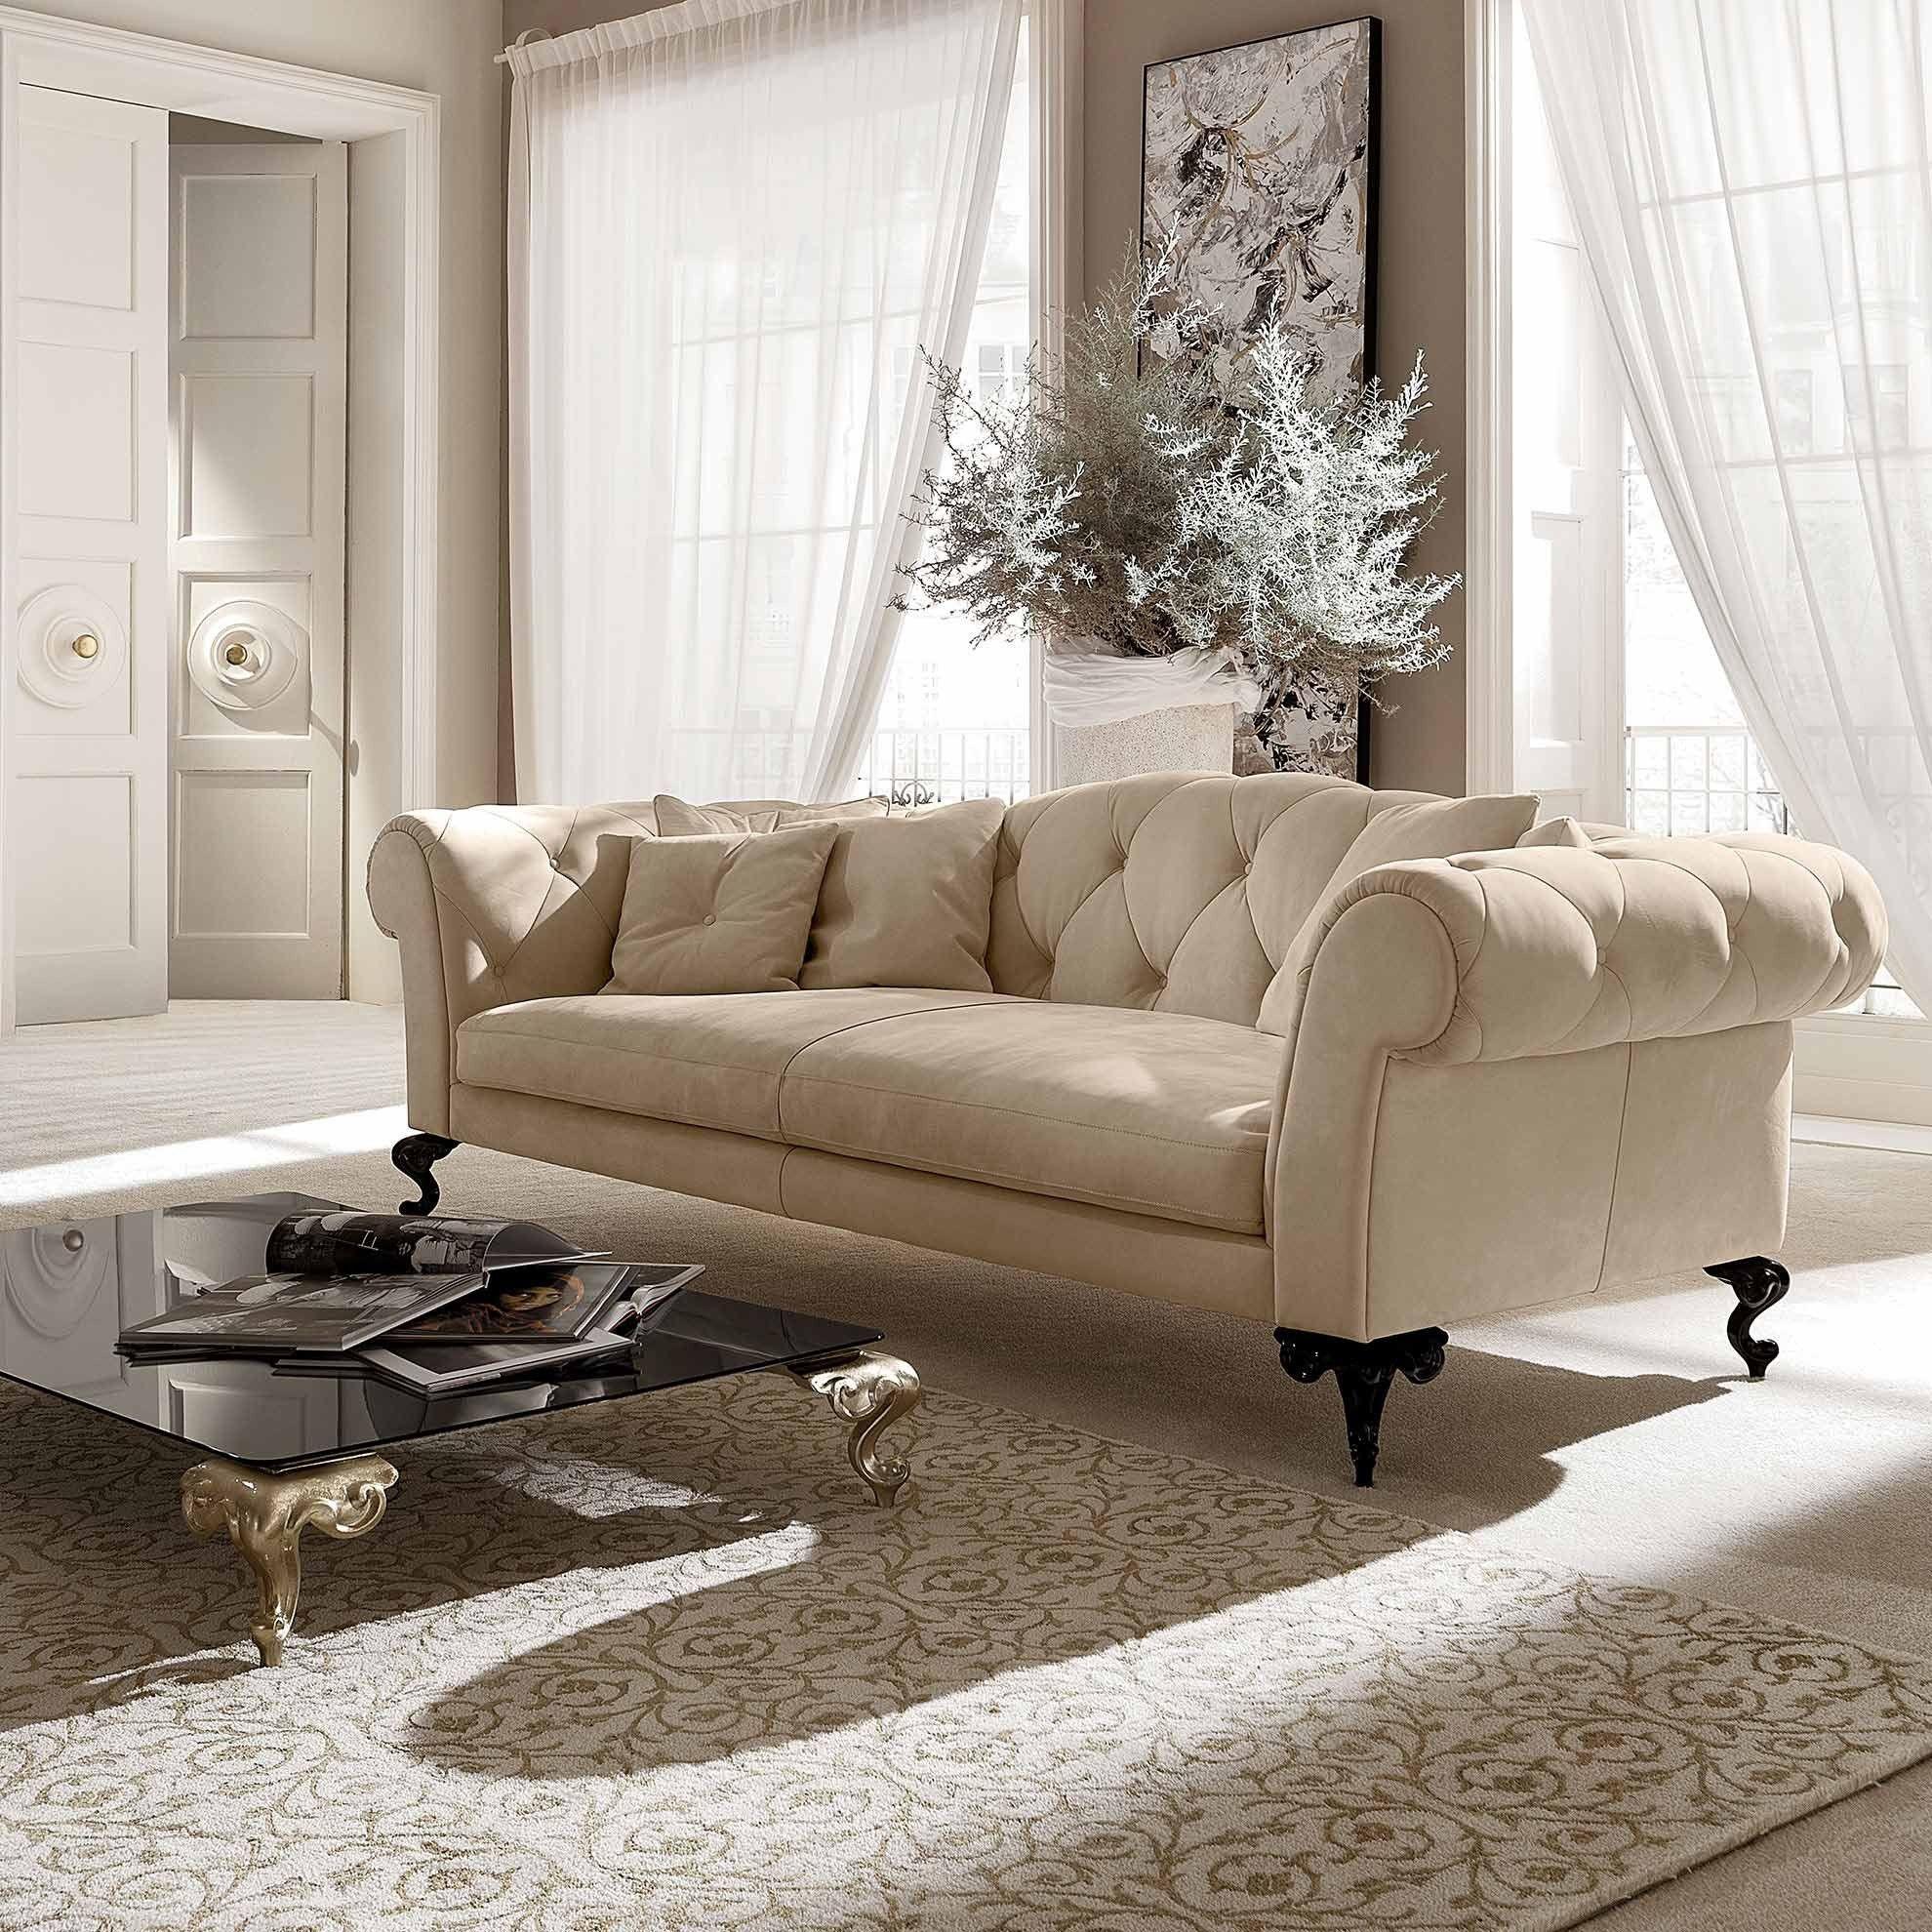 Italian Furniture Brands & Companies I Maestri (With